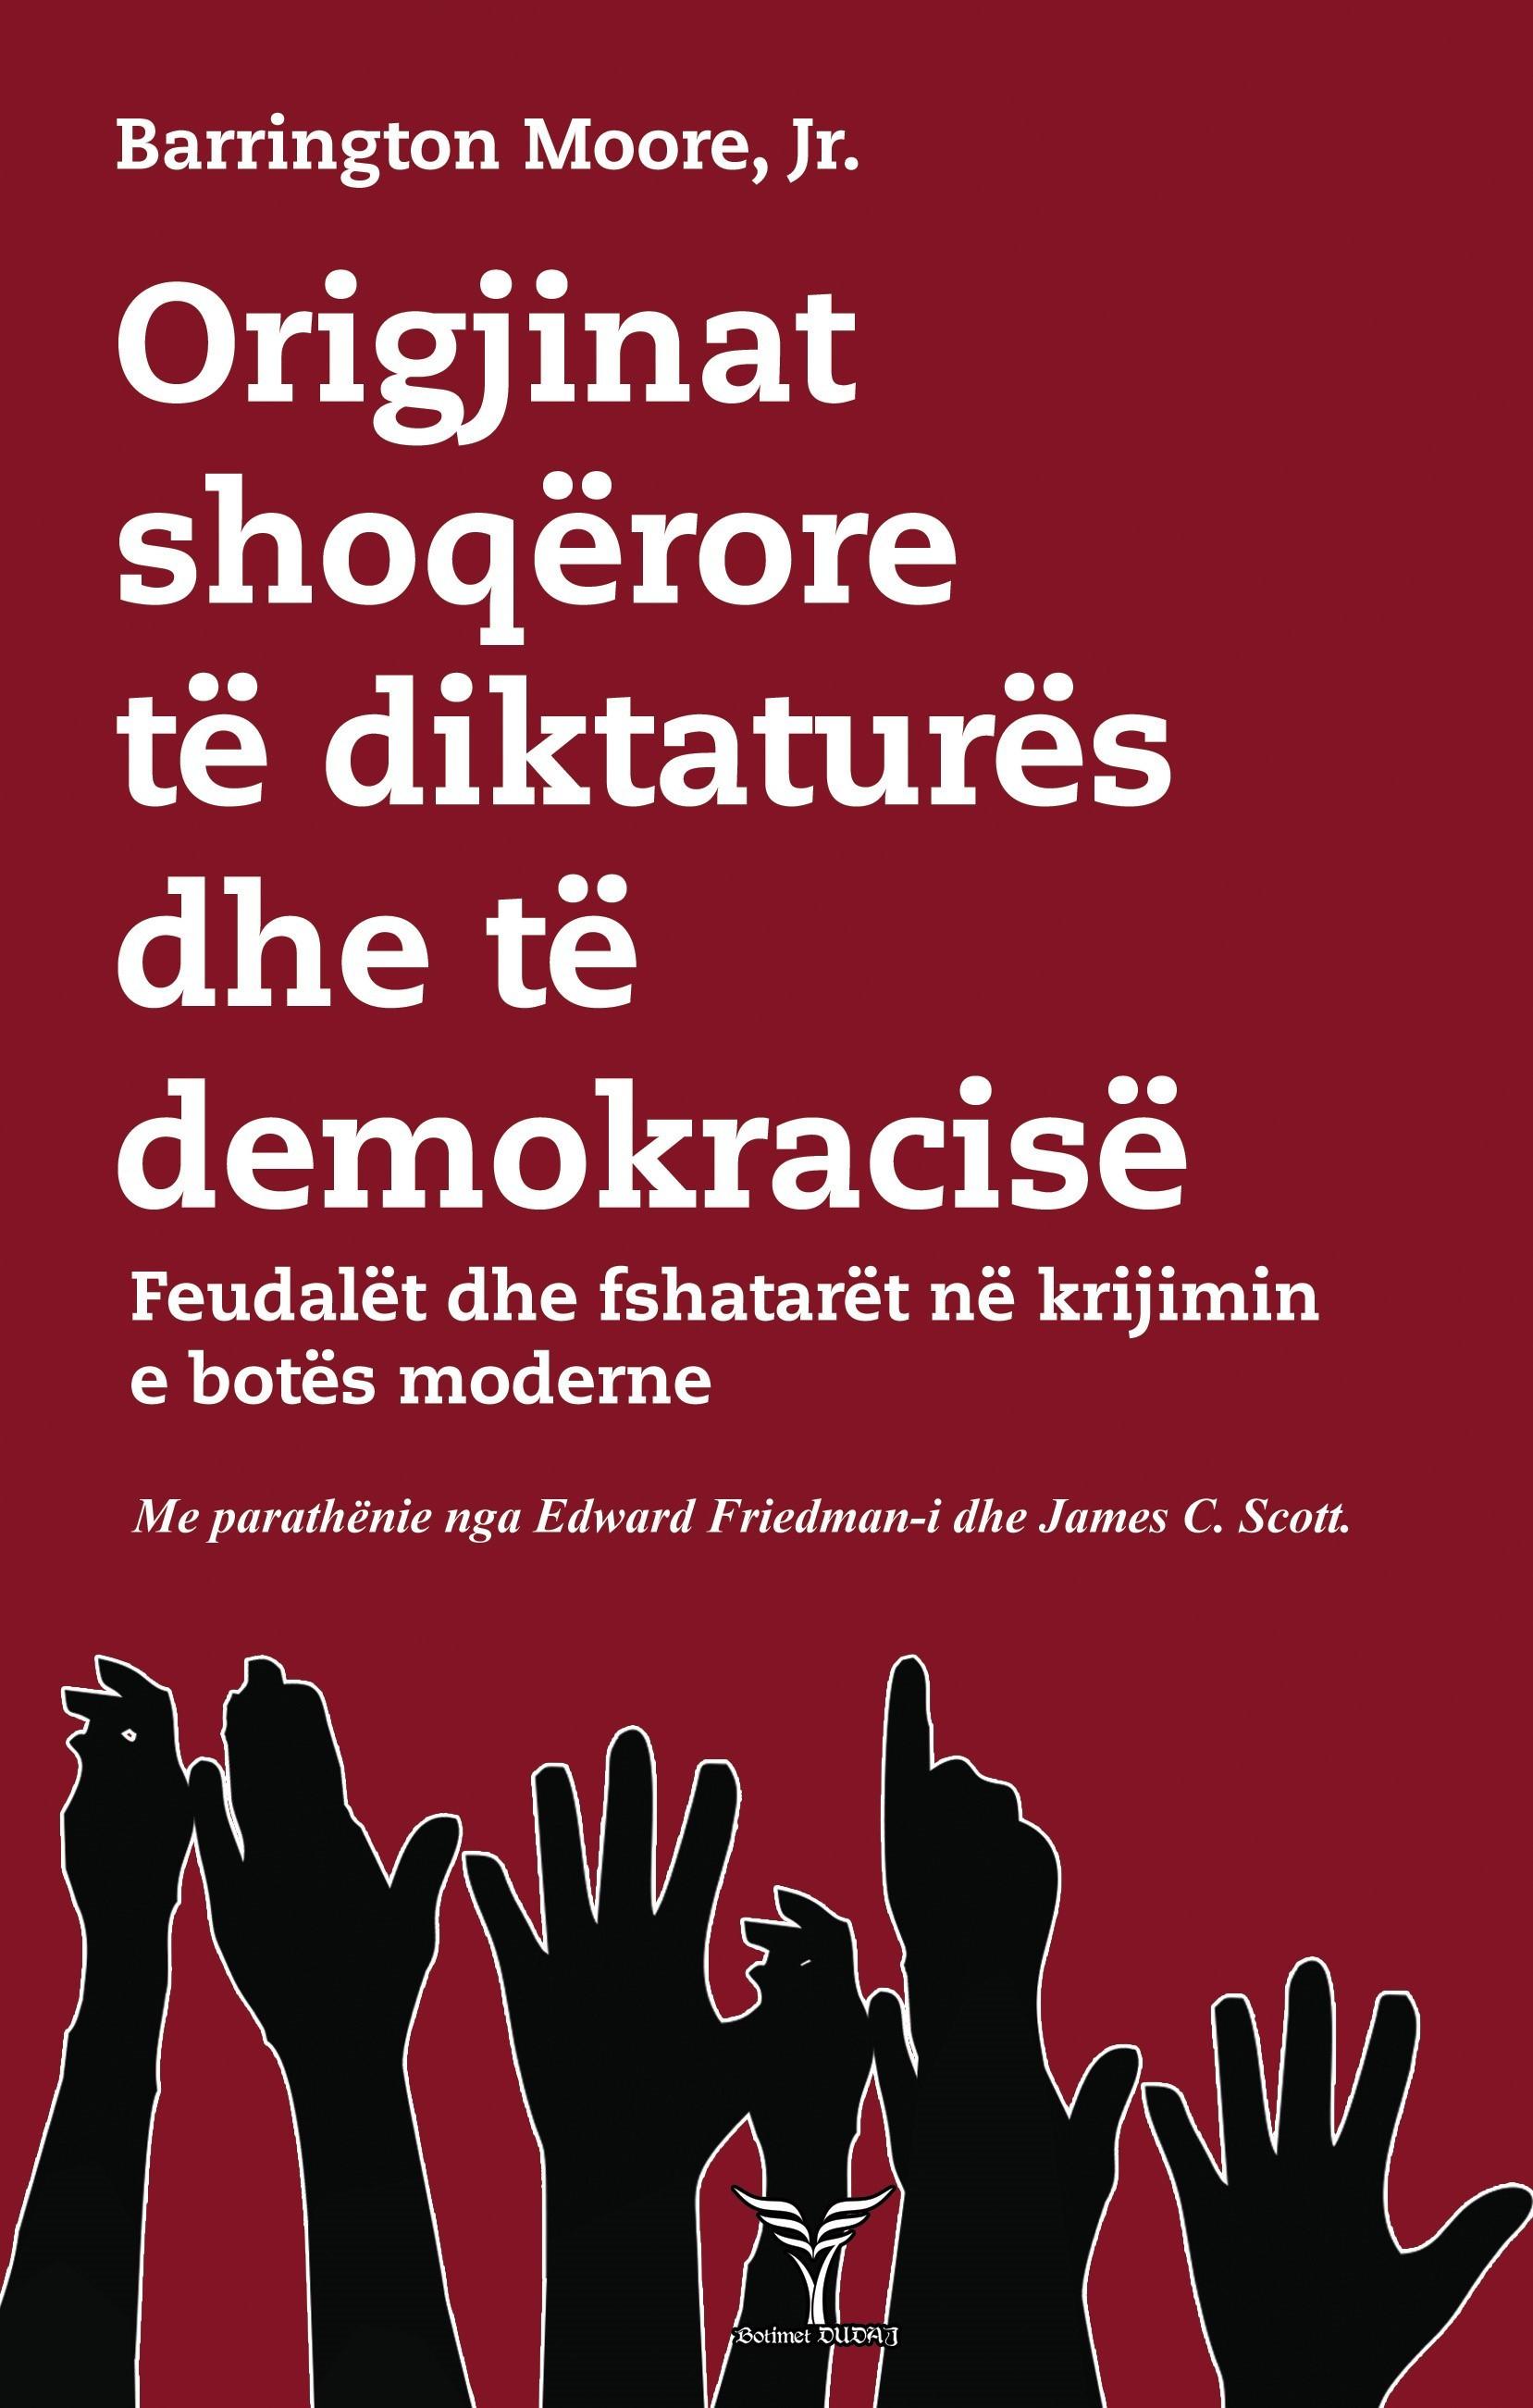 Origjinat shoqerore te diktatures dhe te demokracise